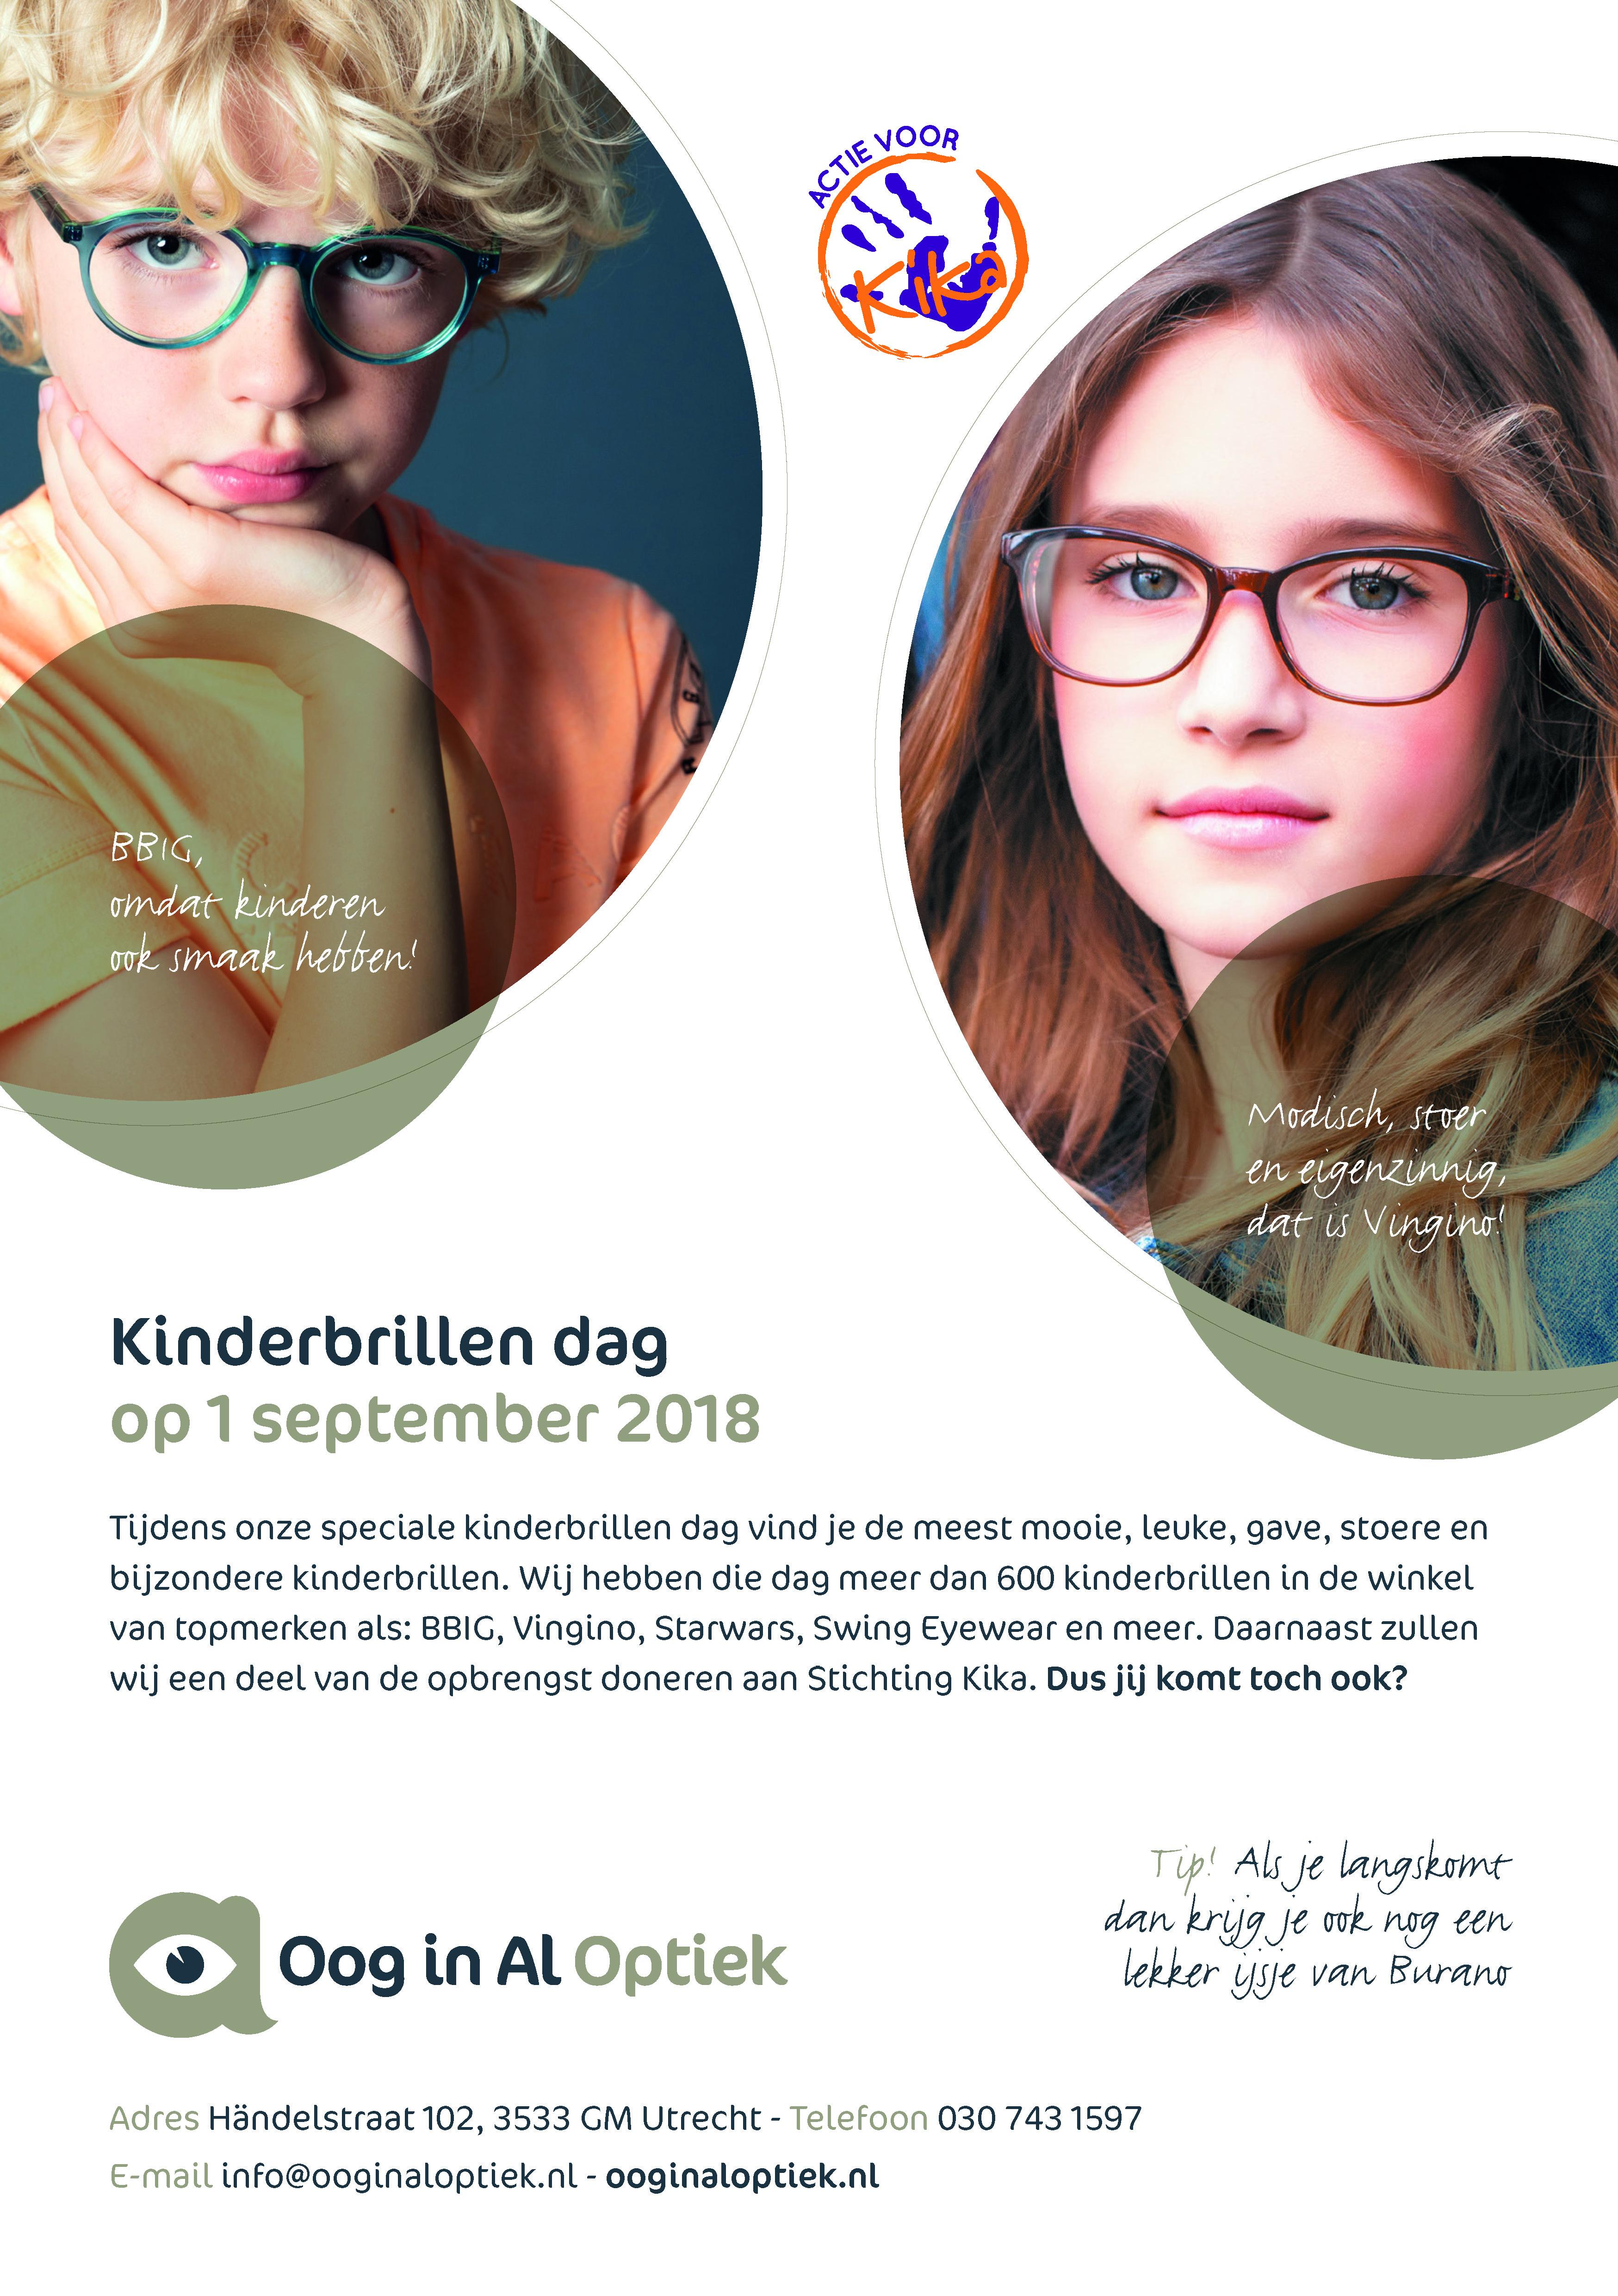 c3fe072d0b866c Oog in Al Optiek Kinderbrillendag 2018 2 - Oog in Al Optiek